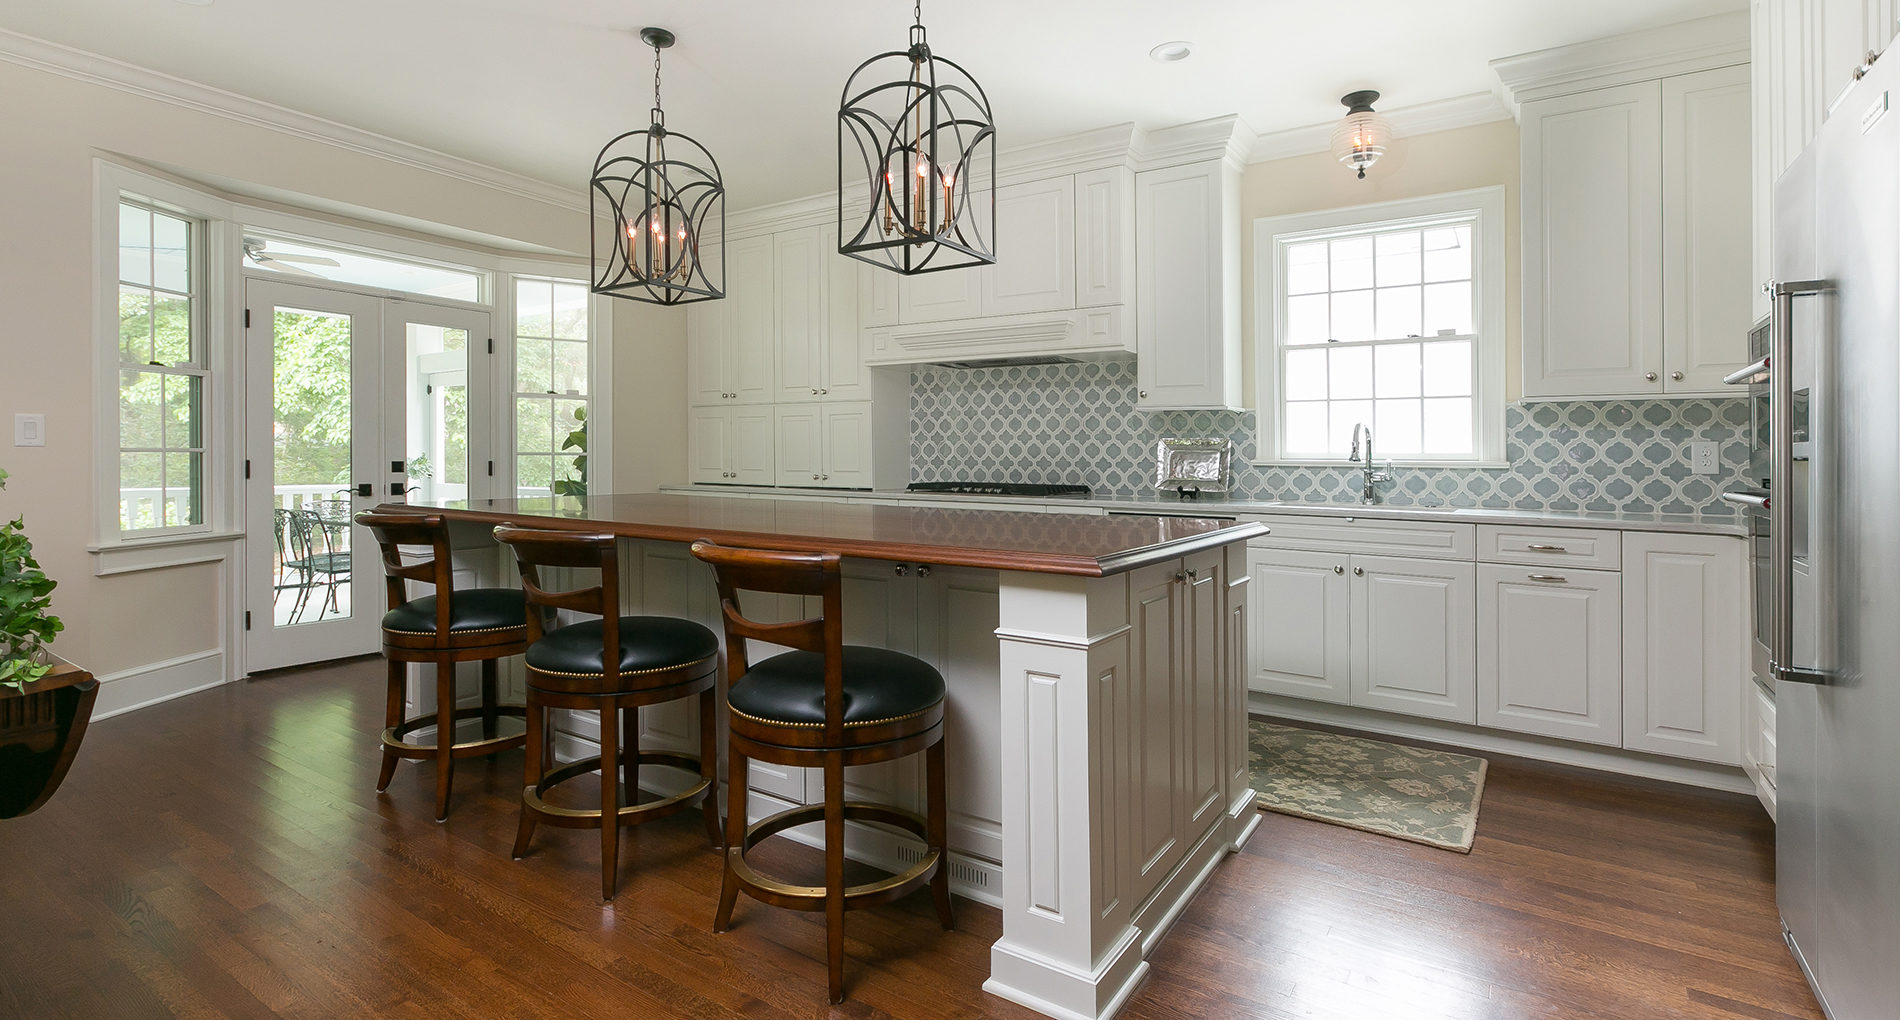 Home Remodel Charleston 105wwalkerdrive Slider1